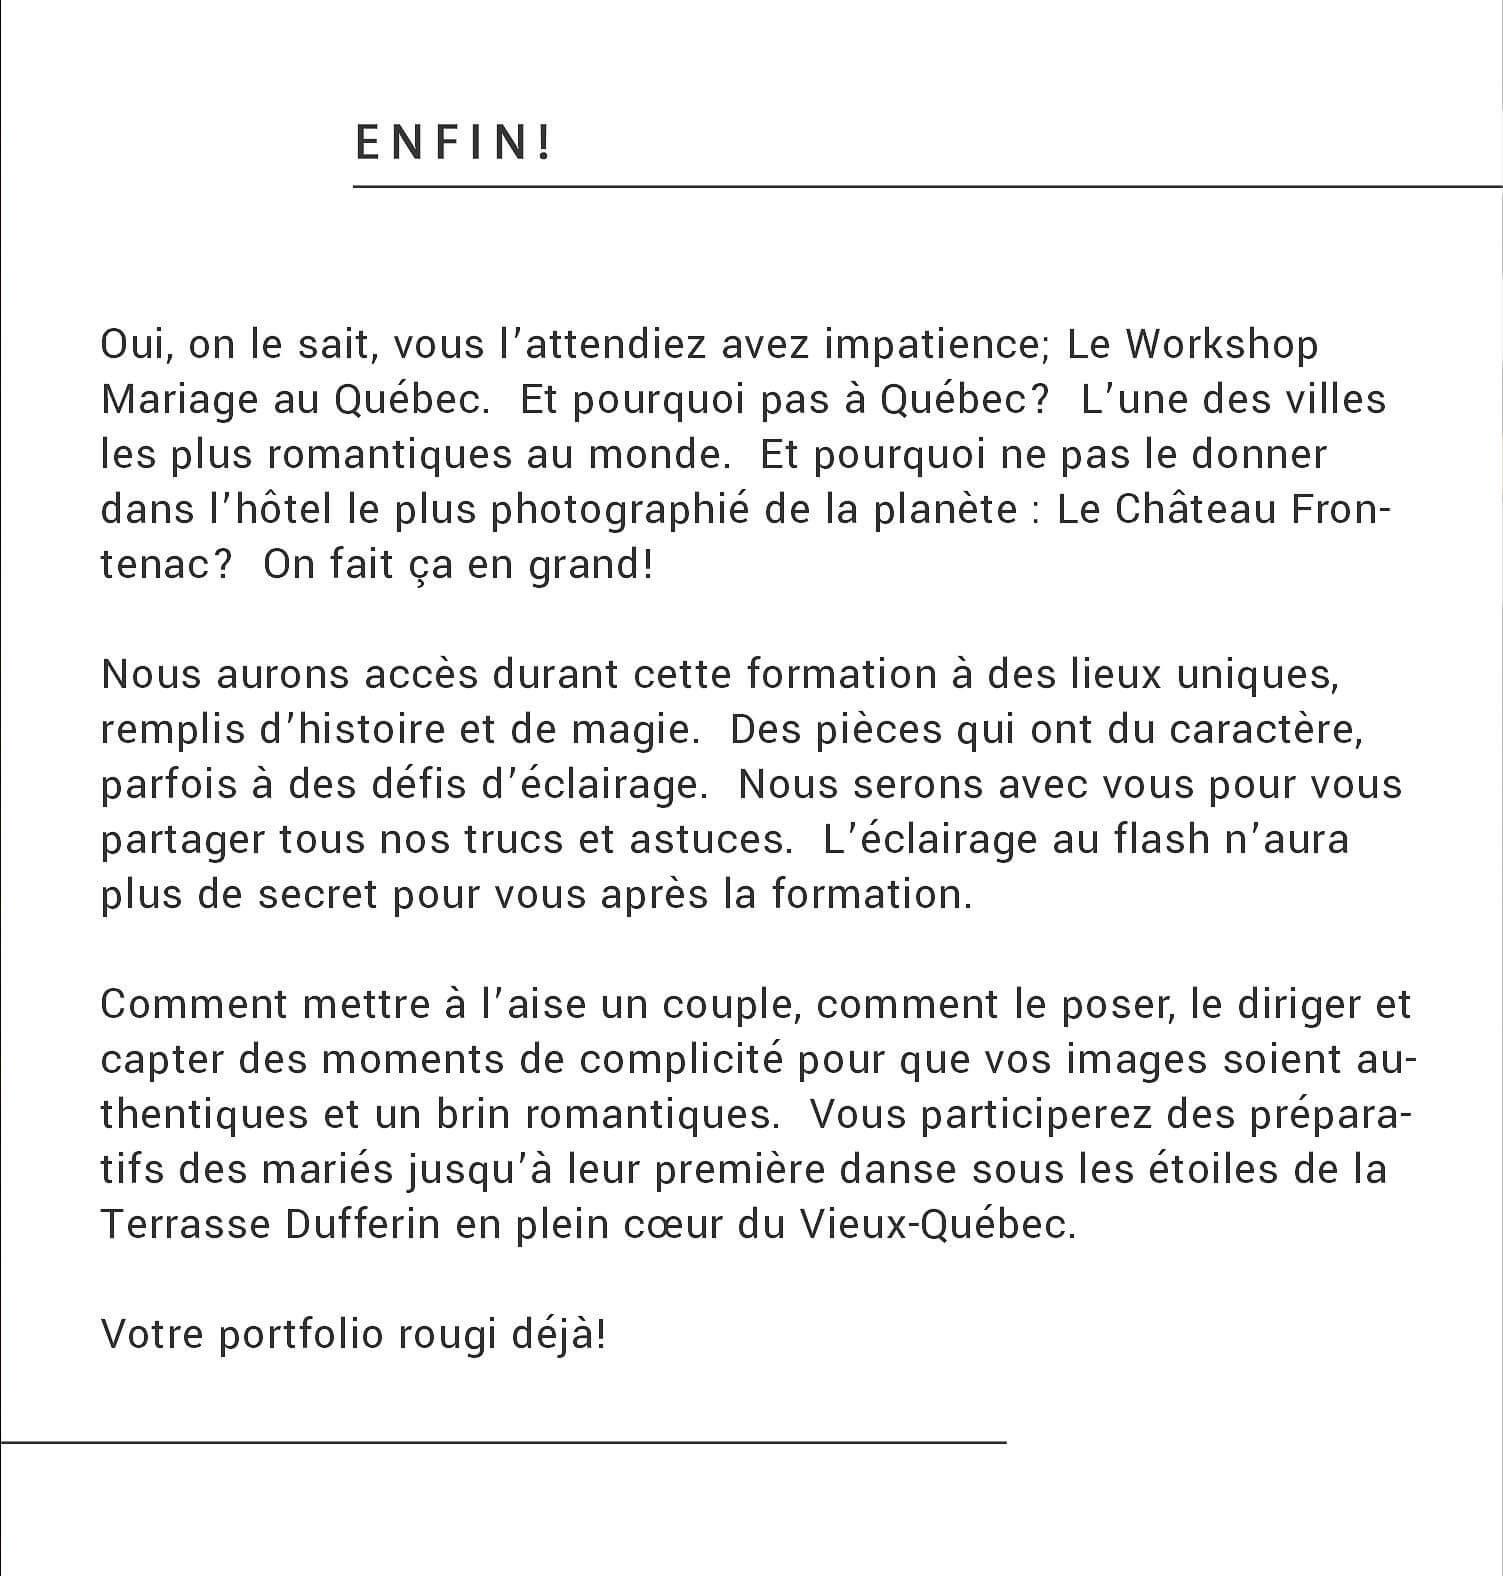 Formation en francais photo